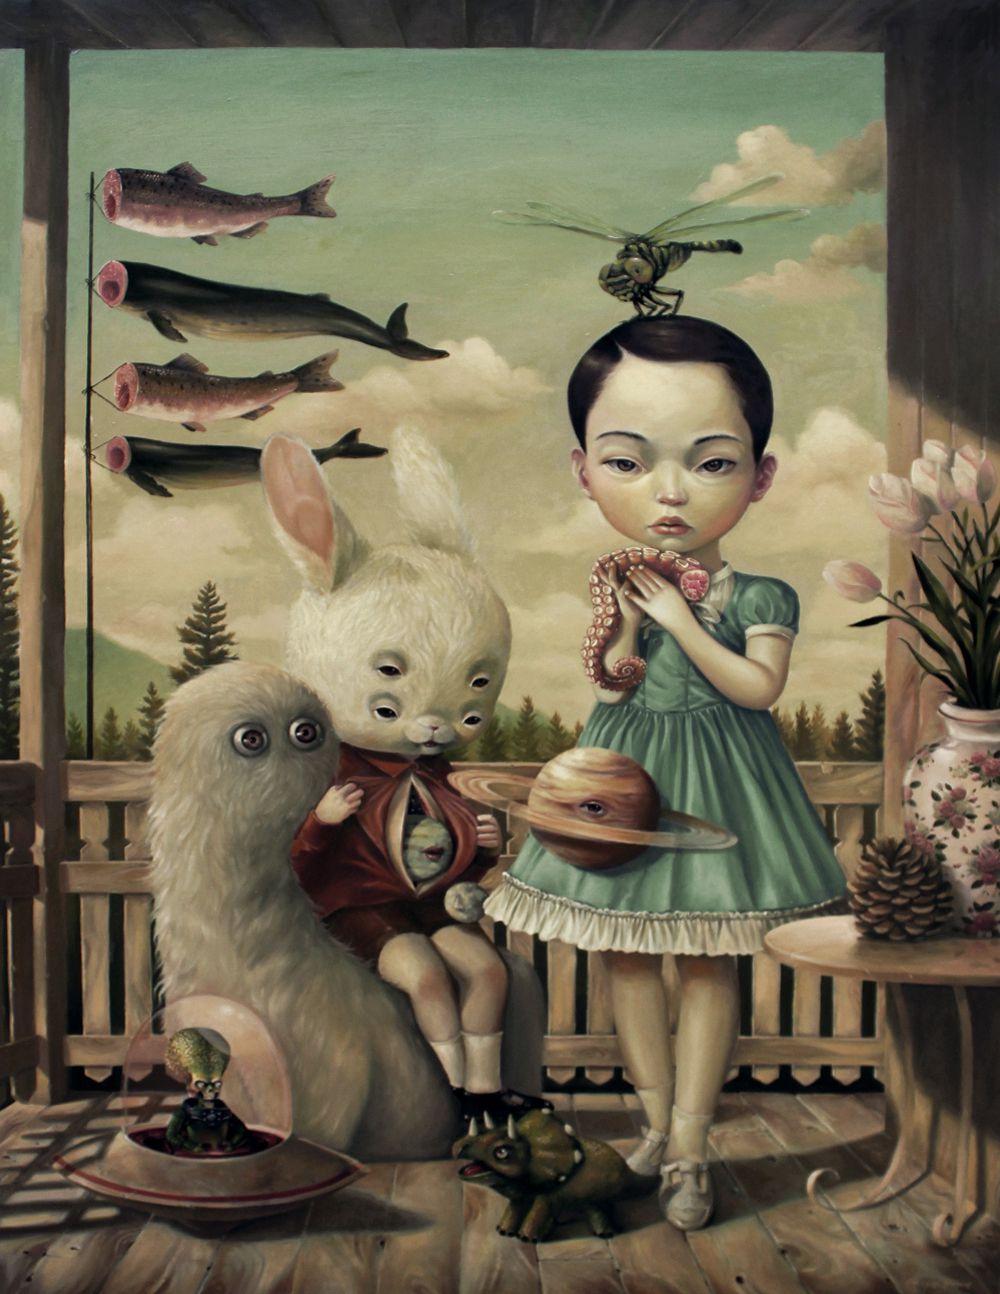 Graciously Bizarre Dark Surrealist Illustrations By Roby Dwi Antono 3